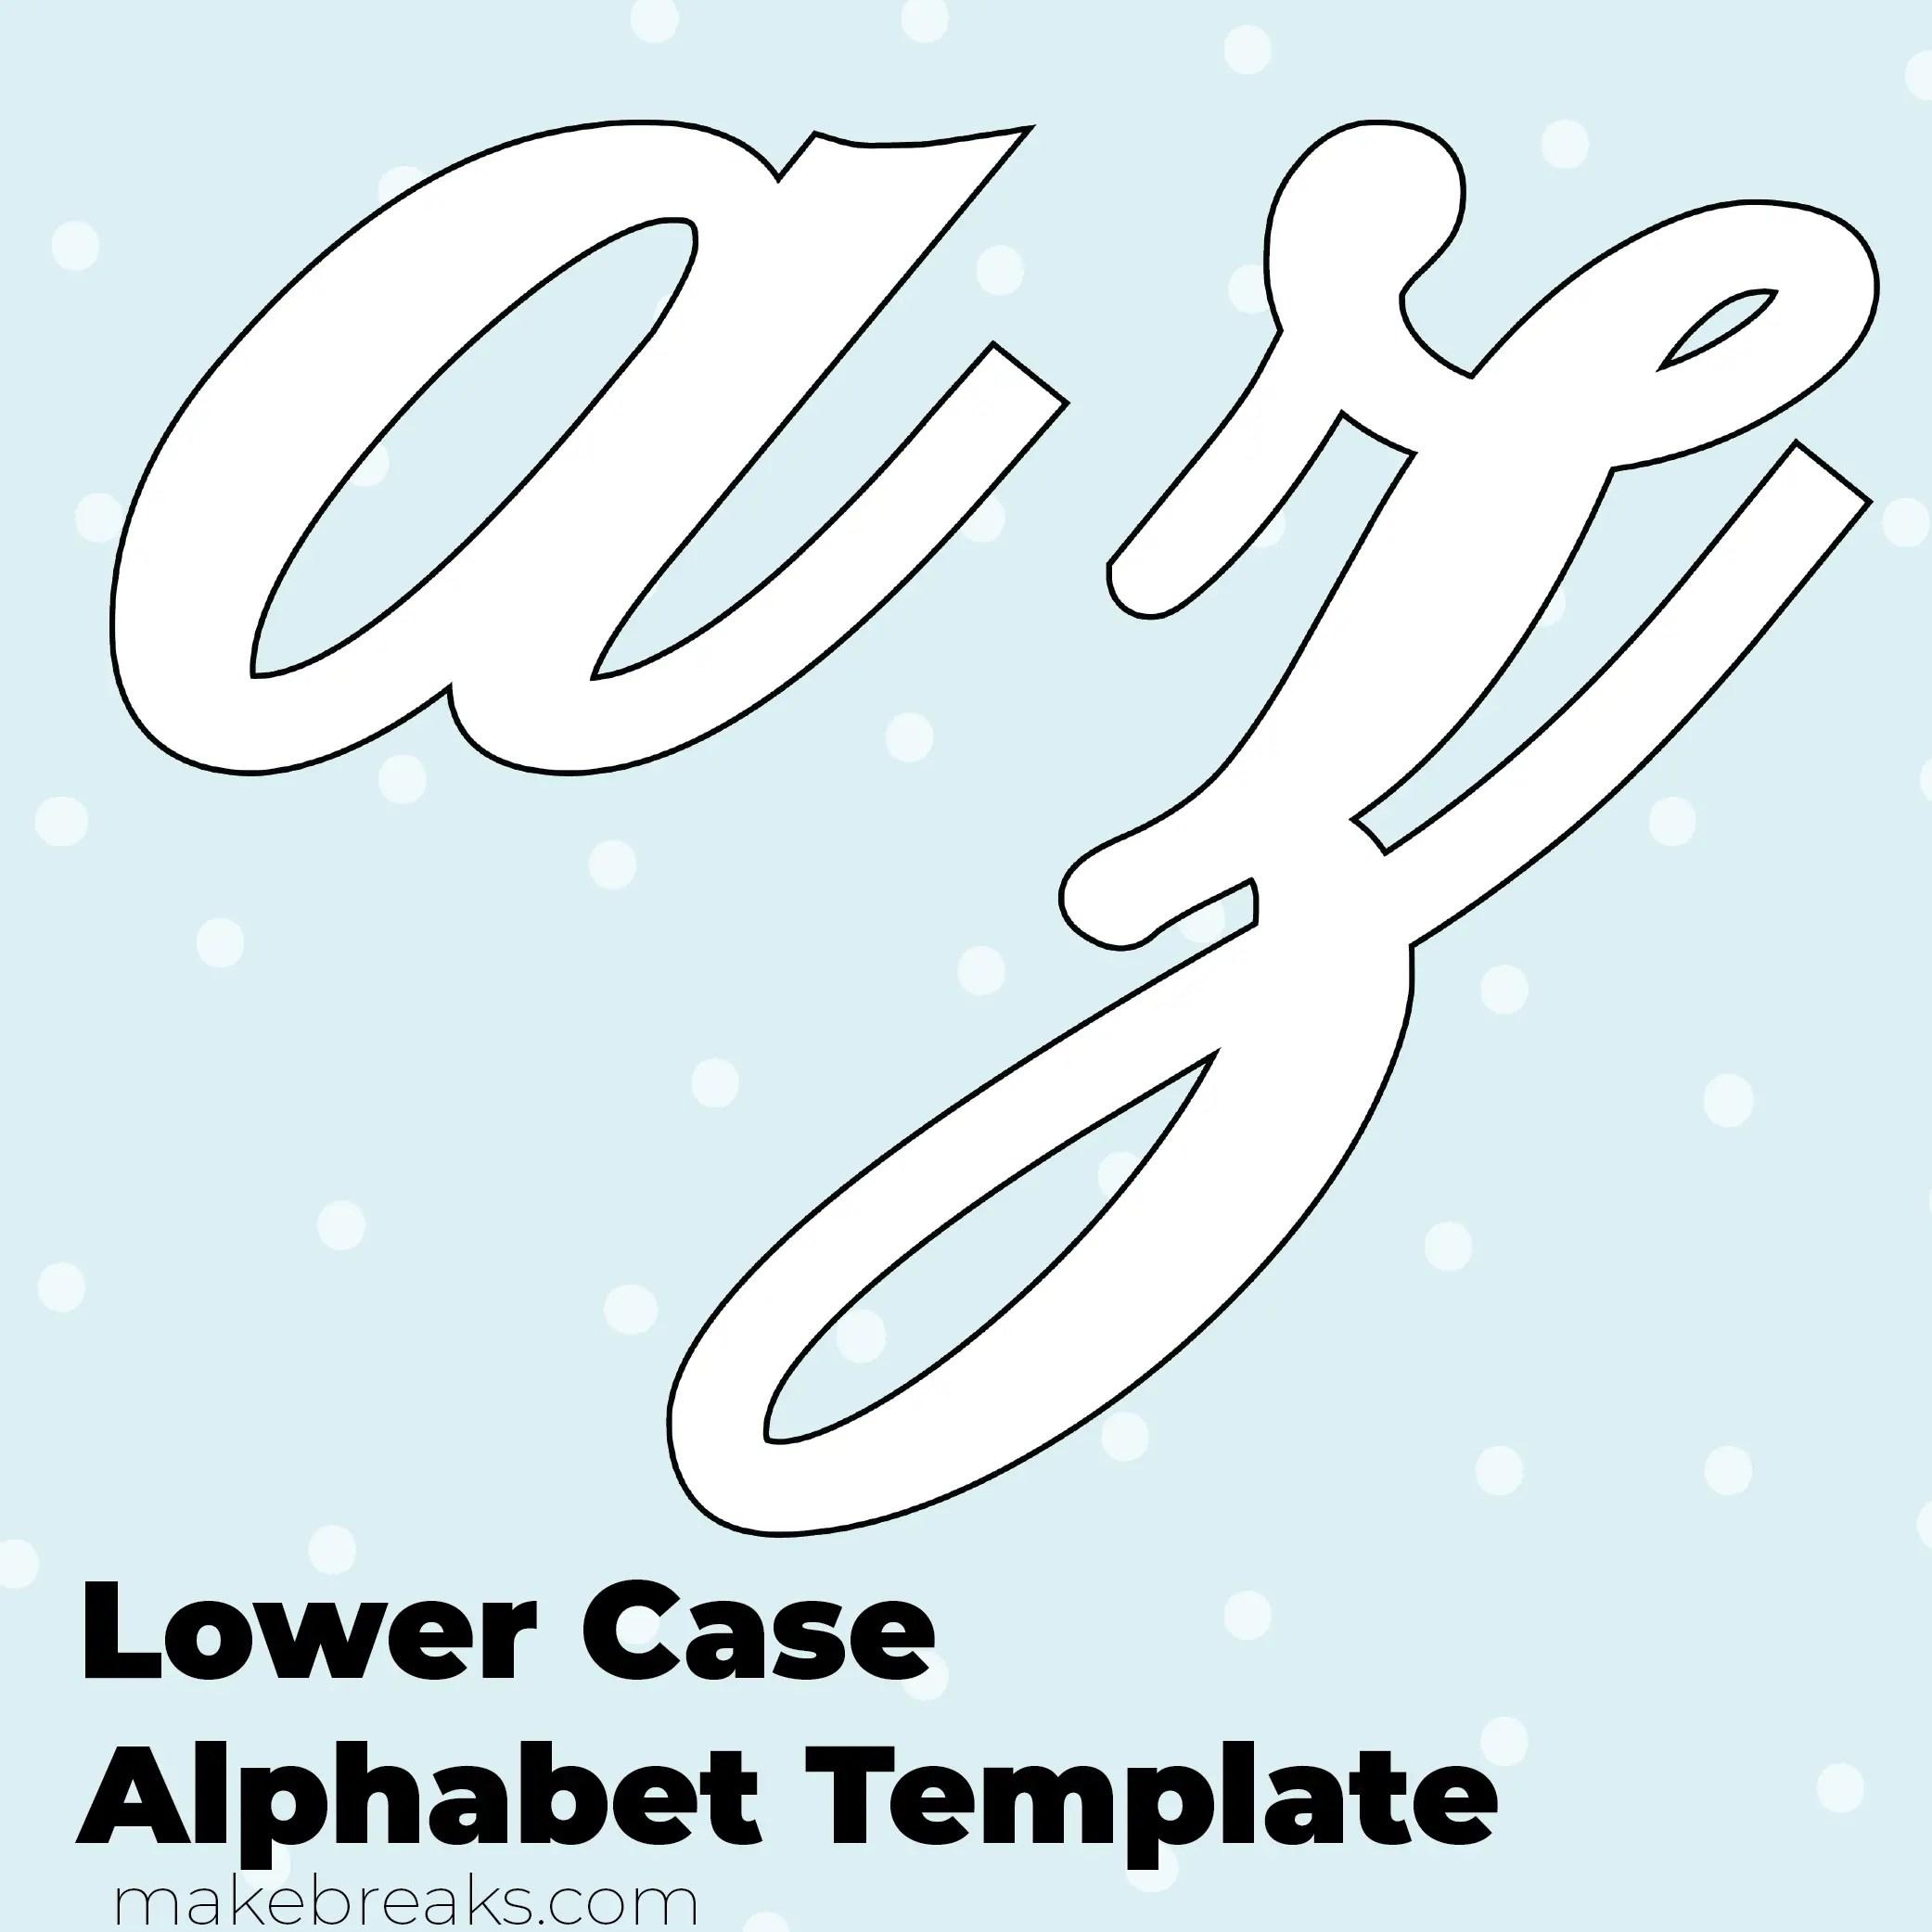 graphic about Free Printable Alphabet Templates named No cost Printable Script Letter Alphabet Template - Decrease Scenario